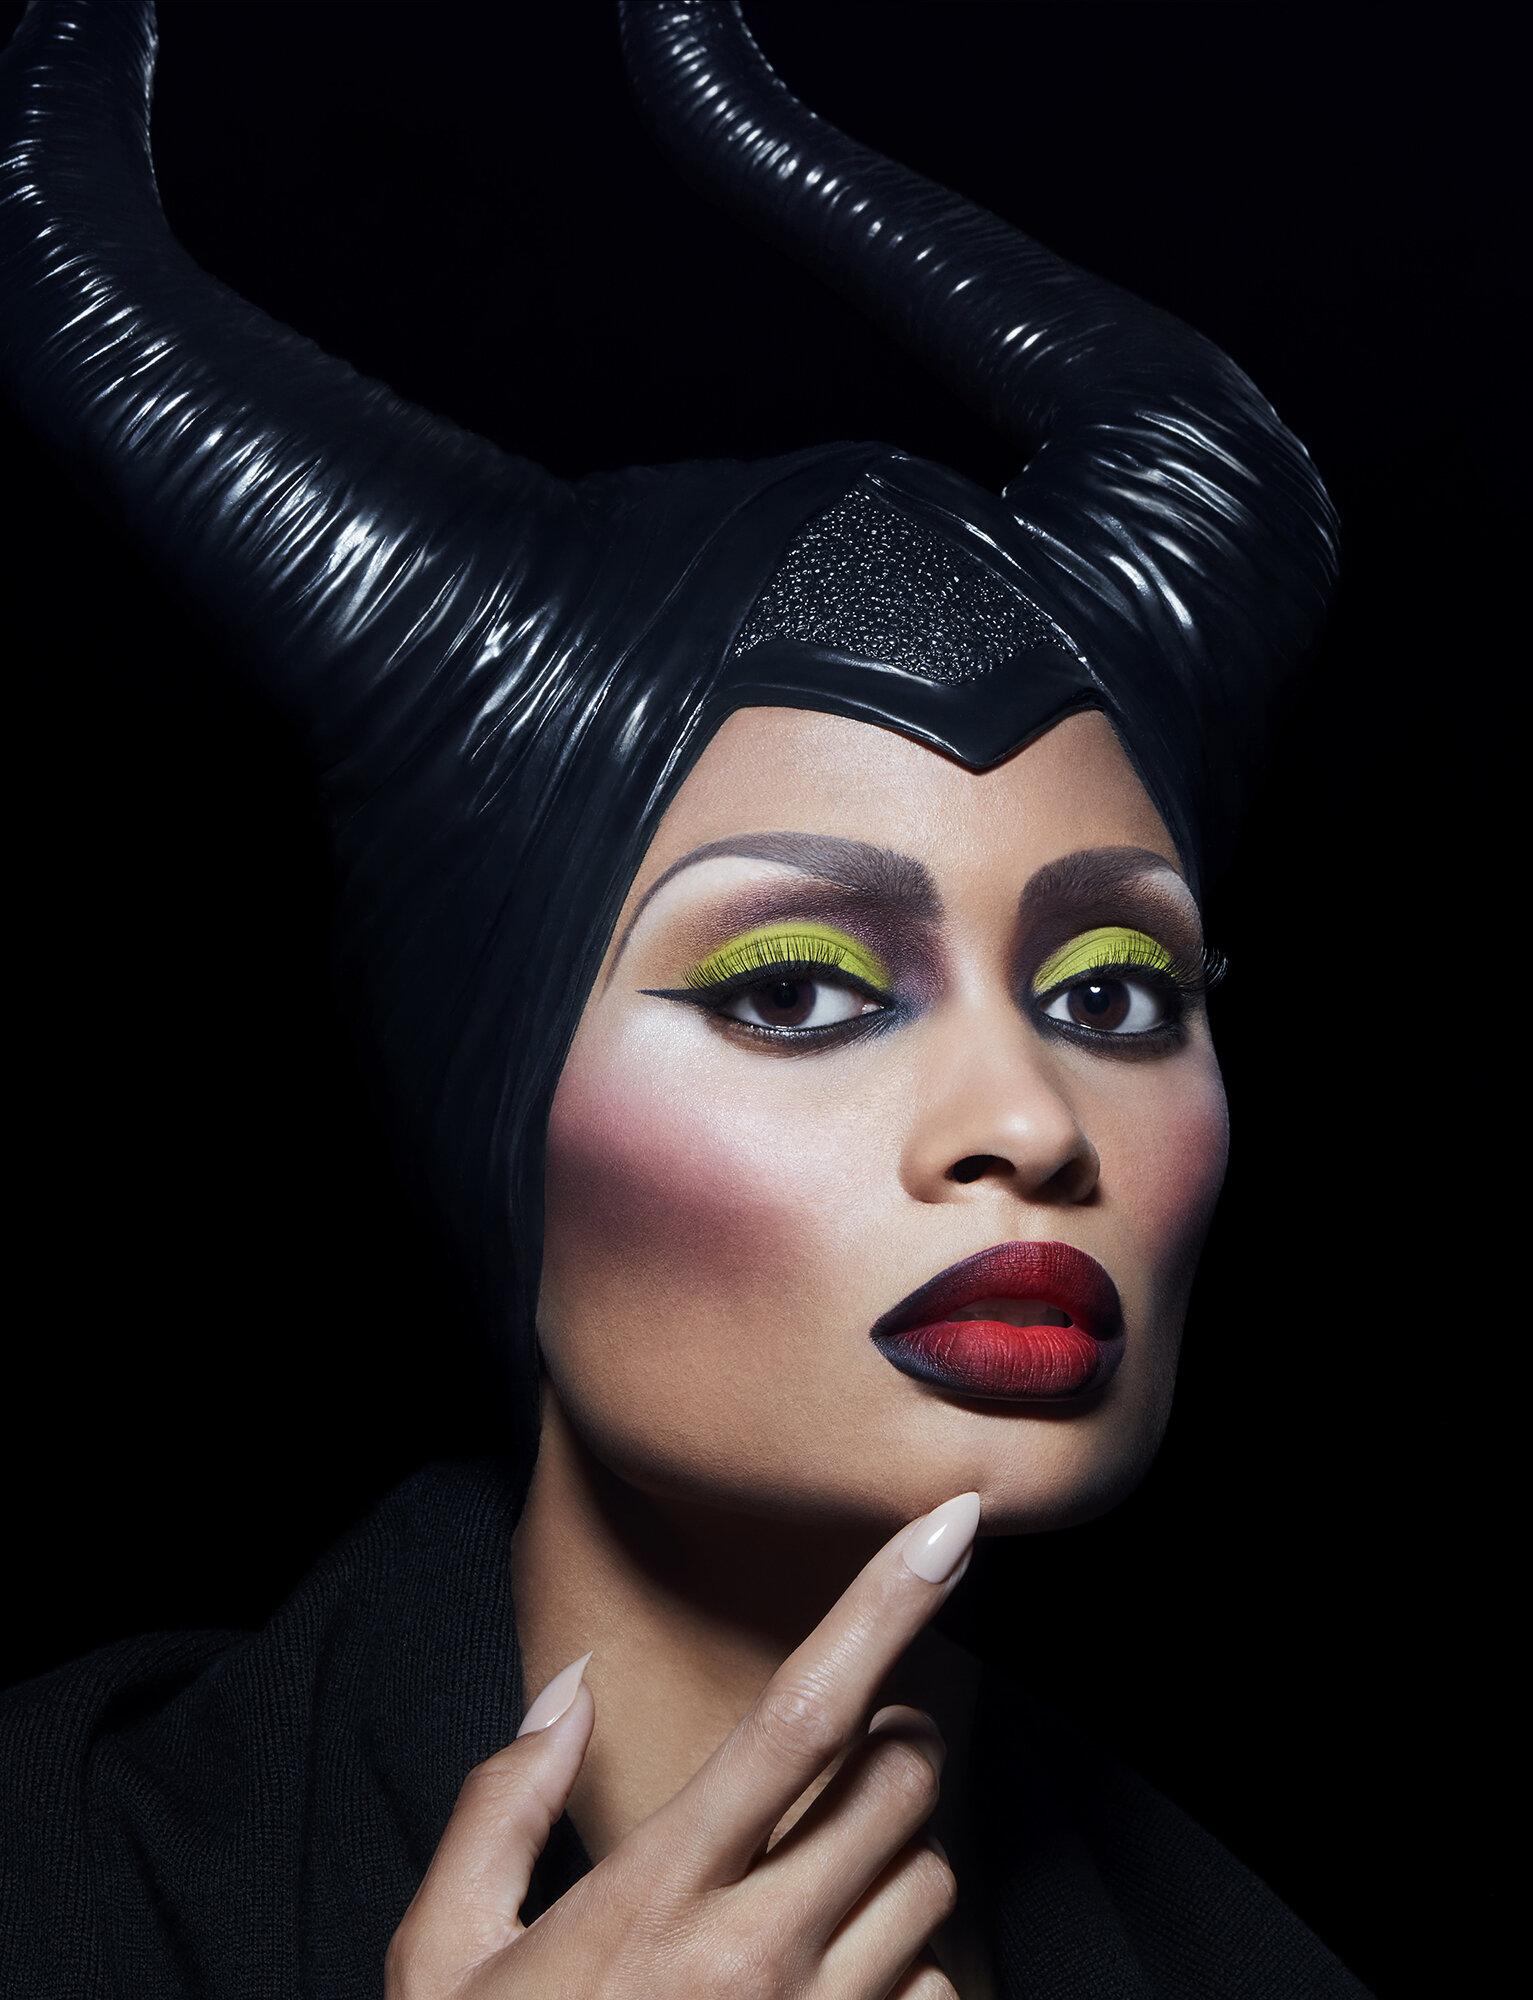 191031_MacCosmetics_Maleficent_Evil_By_BriJohnsonStudios.jpg.jpg